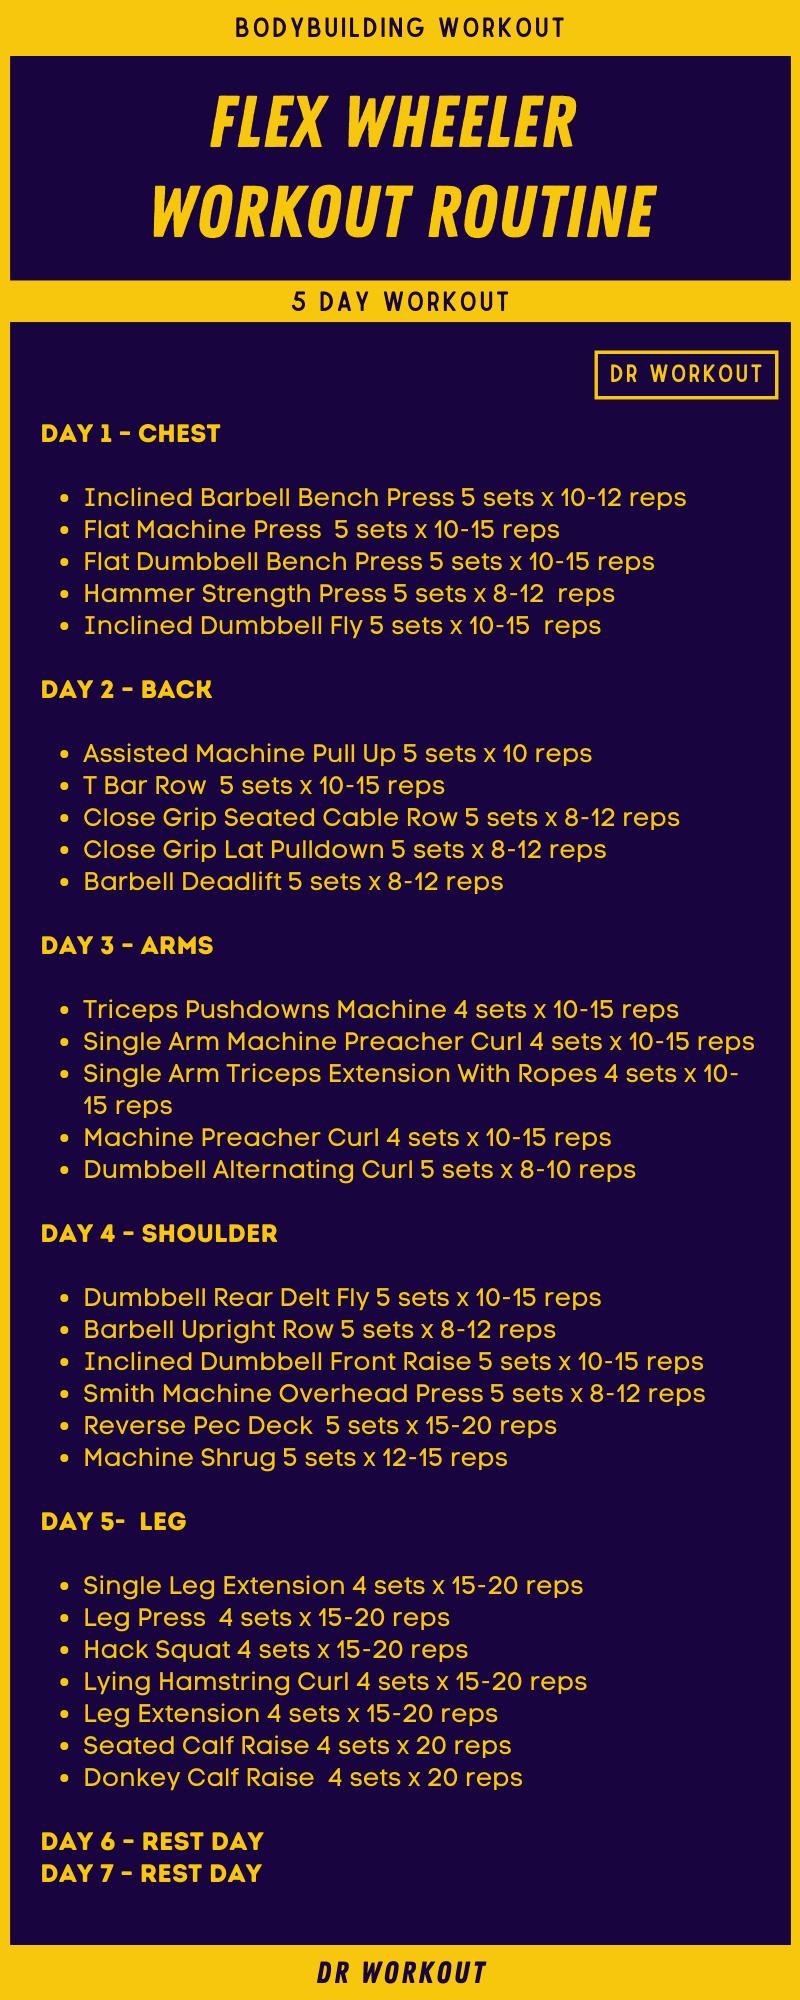 Flex Wheeler Workout Routine